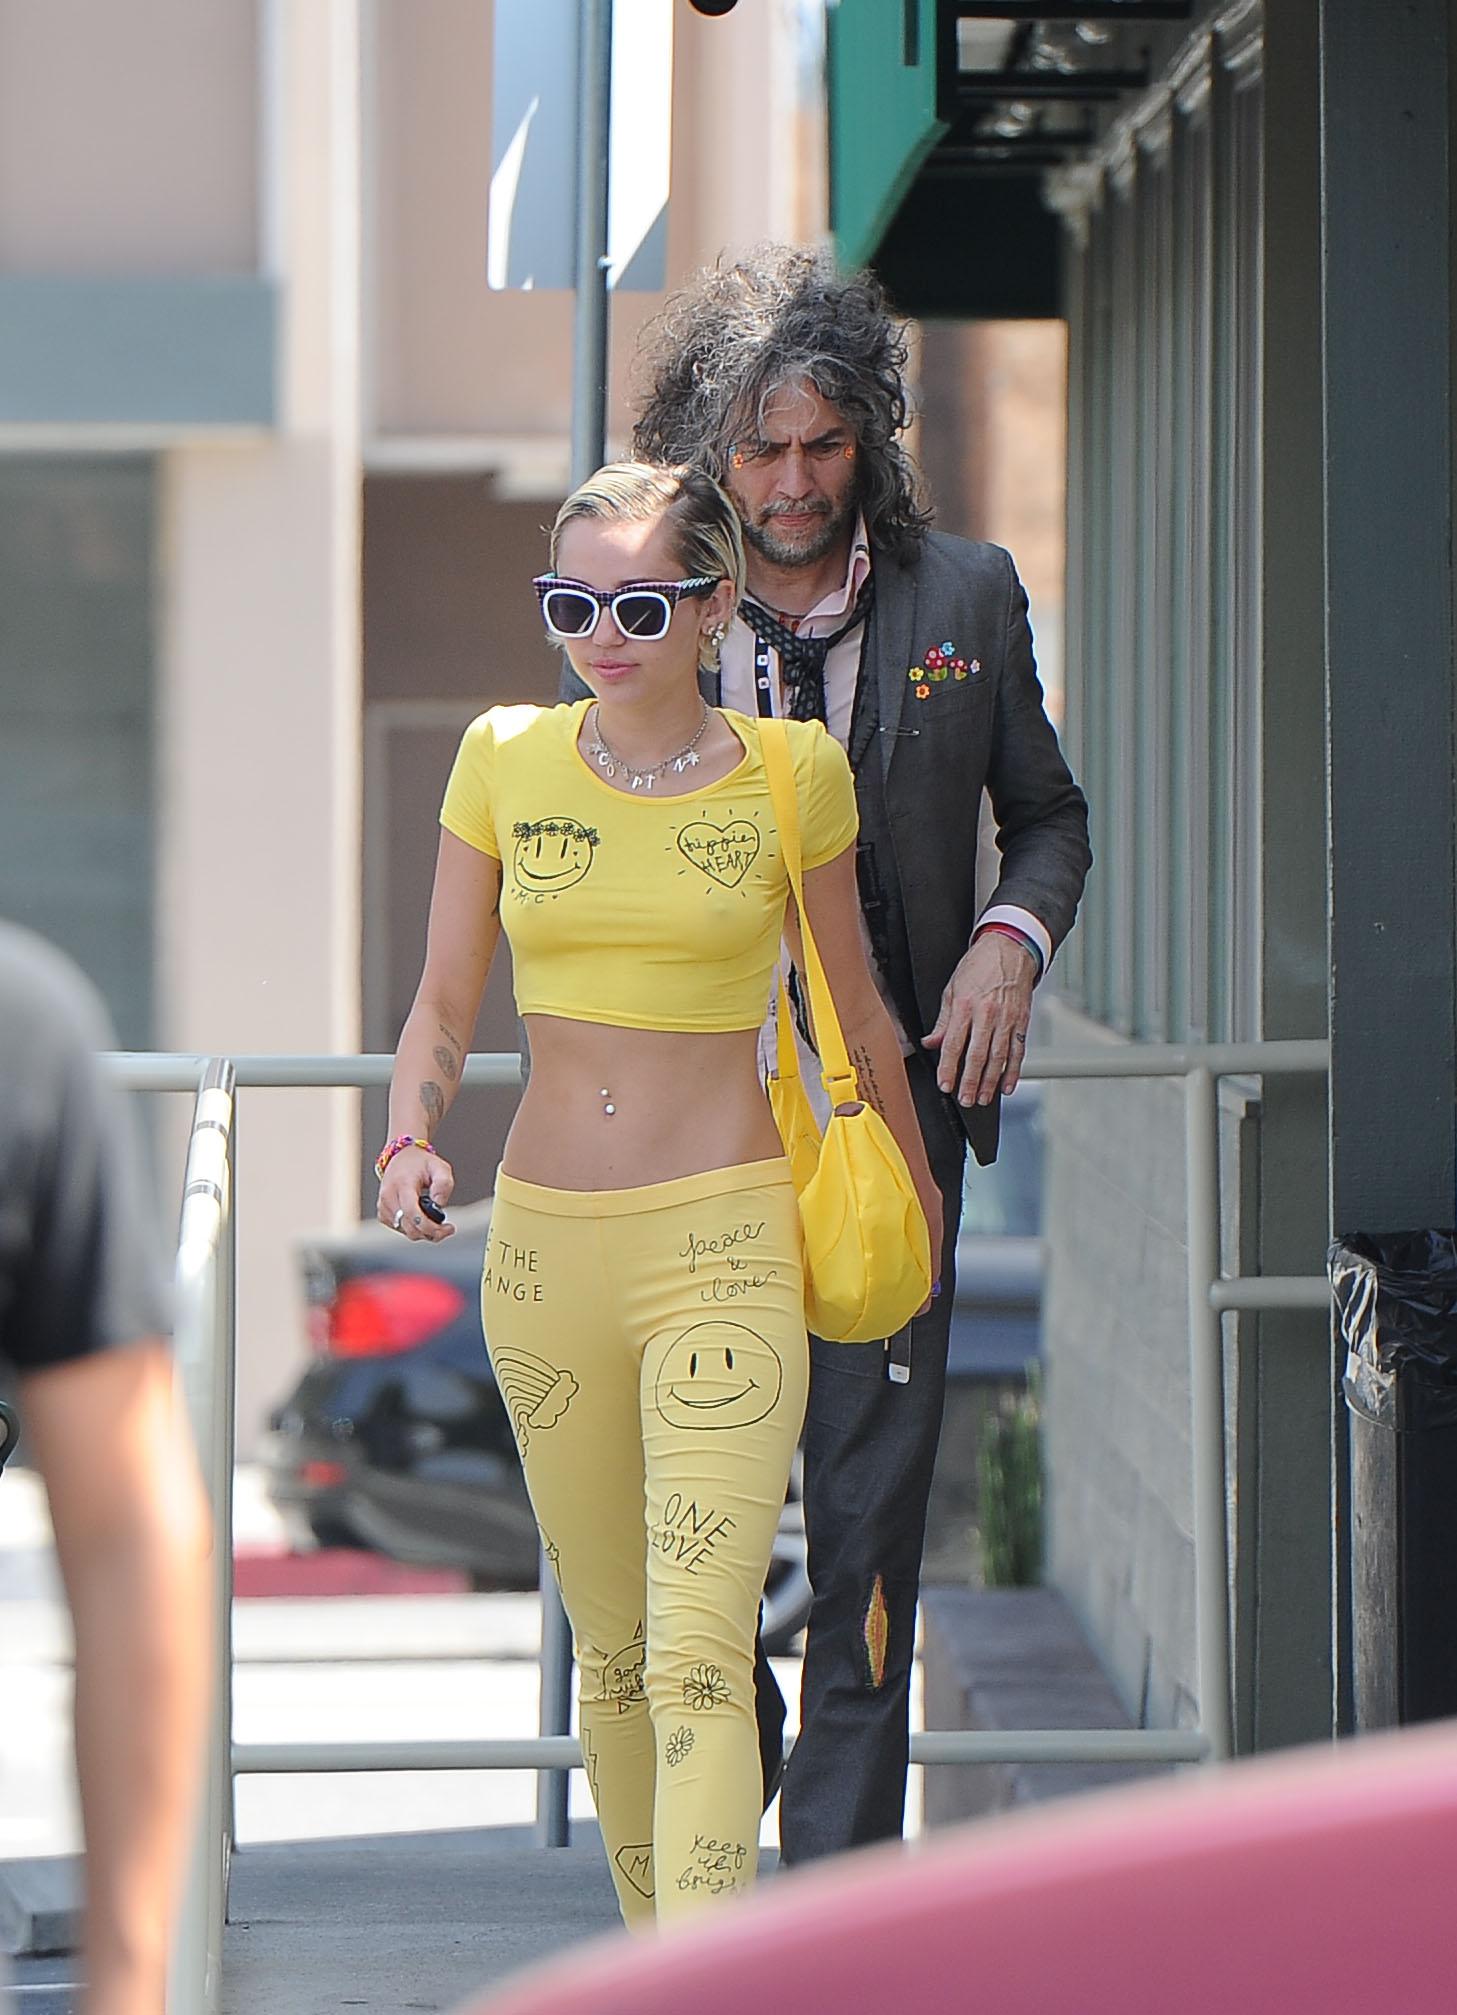 Miley-Cyrus-See-Through-top-7 Celebrity-Slipscom-8918